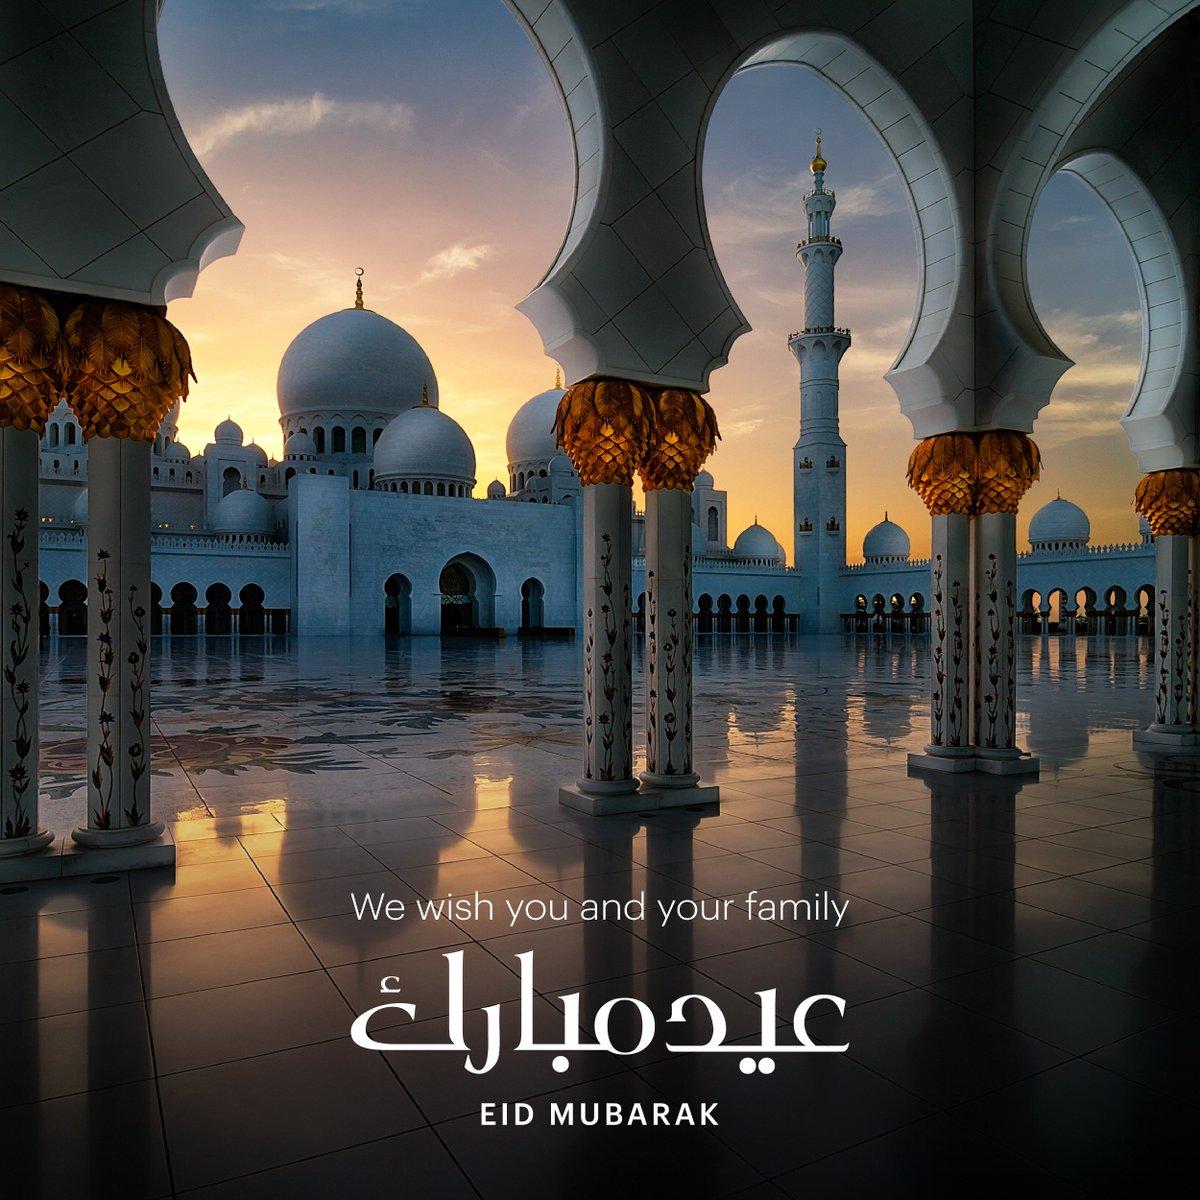 May this Eid bring peace, happiness and prosperity to you and your family. Eid Mubarak from AQUA Properties!  #AQUAProperties #EidMubarak #Eid2019 #EidAlFitr #Ramadan #MyDubai #UAE https://t.co/uOdzd6PC0E